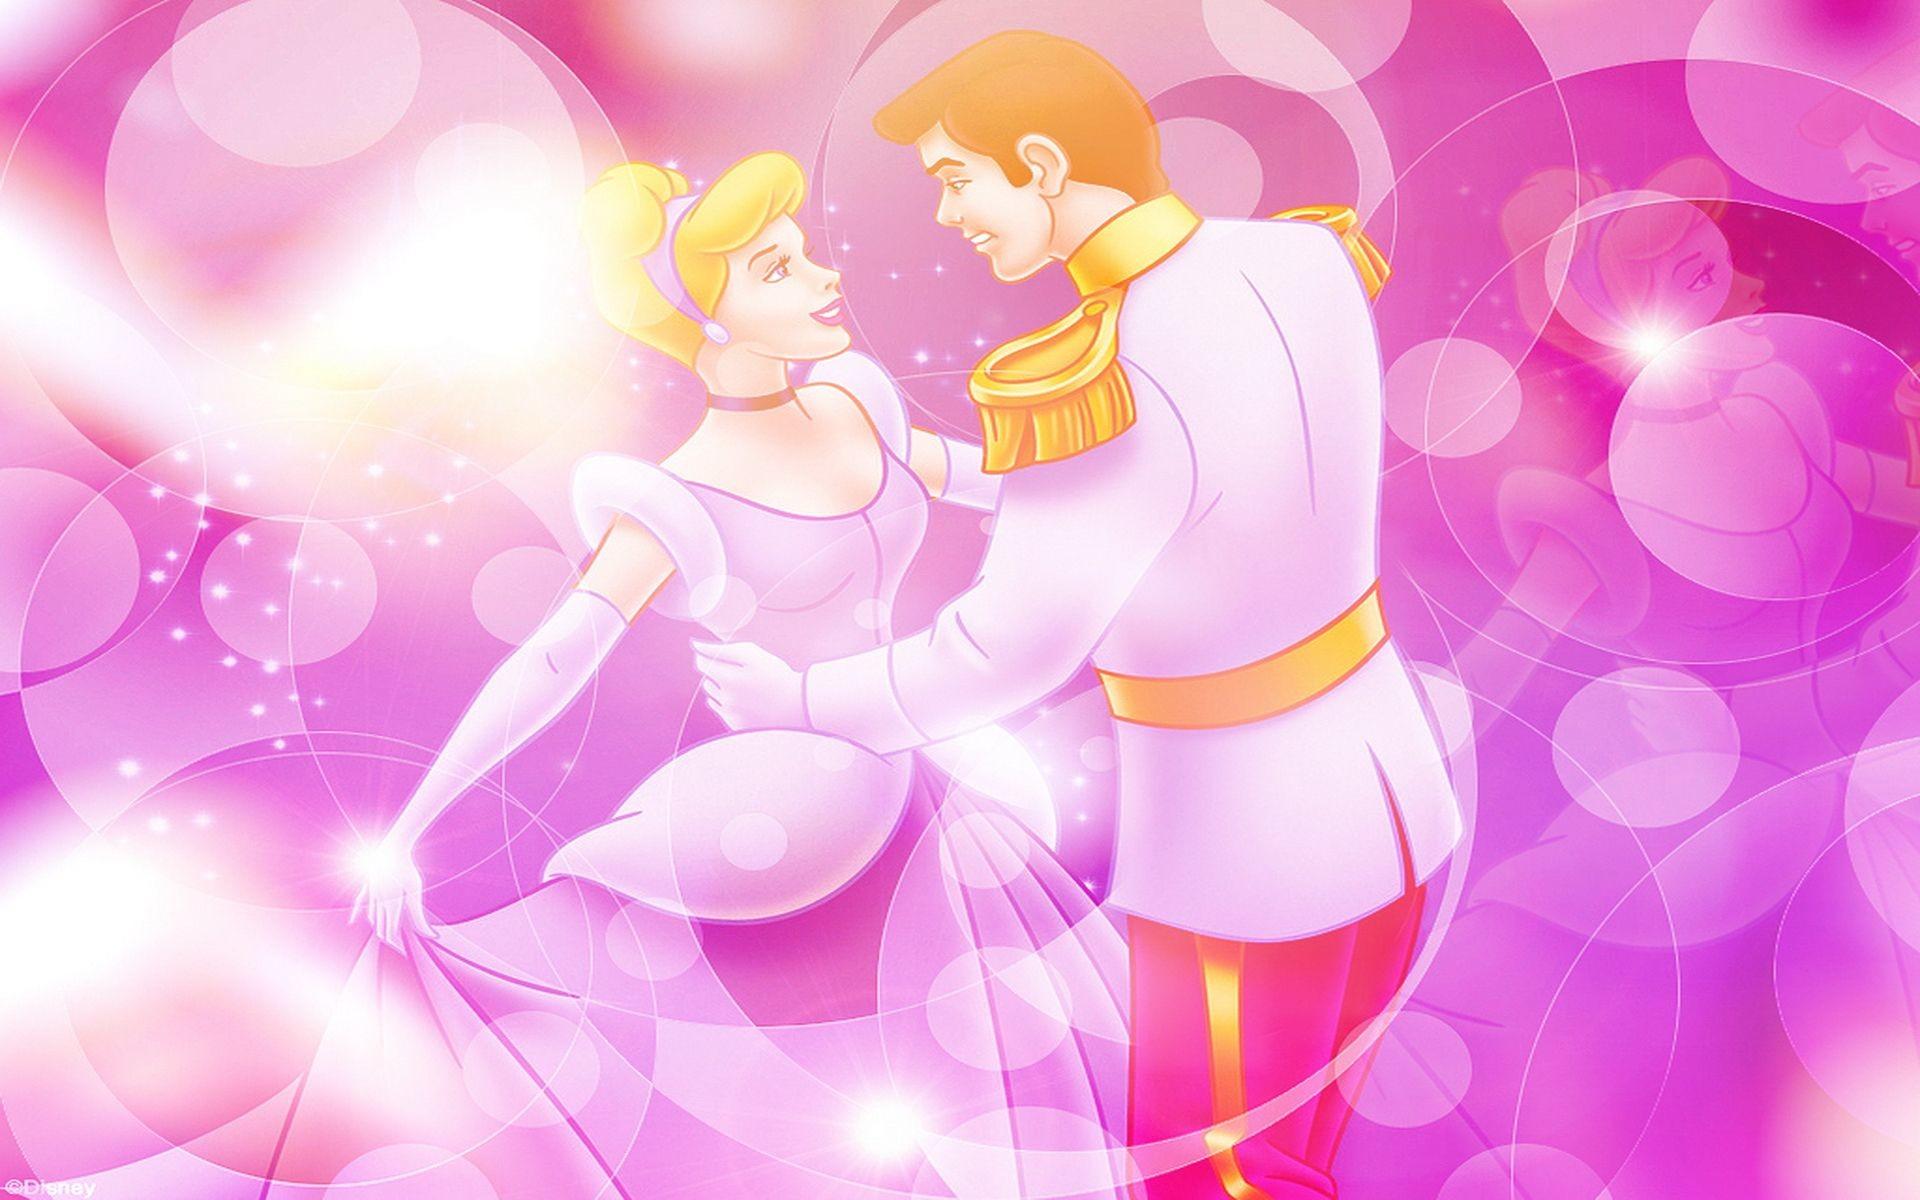 Princess Disney Wallpaper 59 Pictures